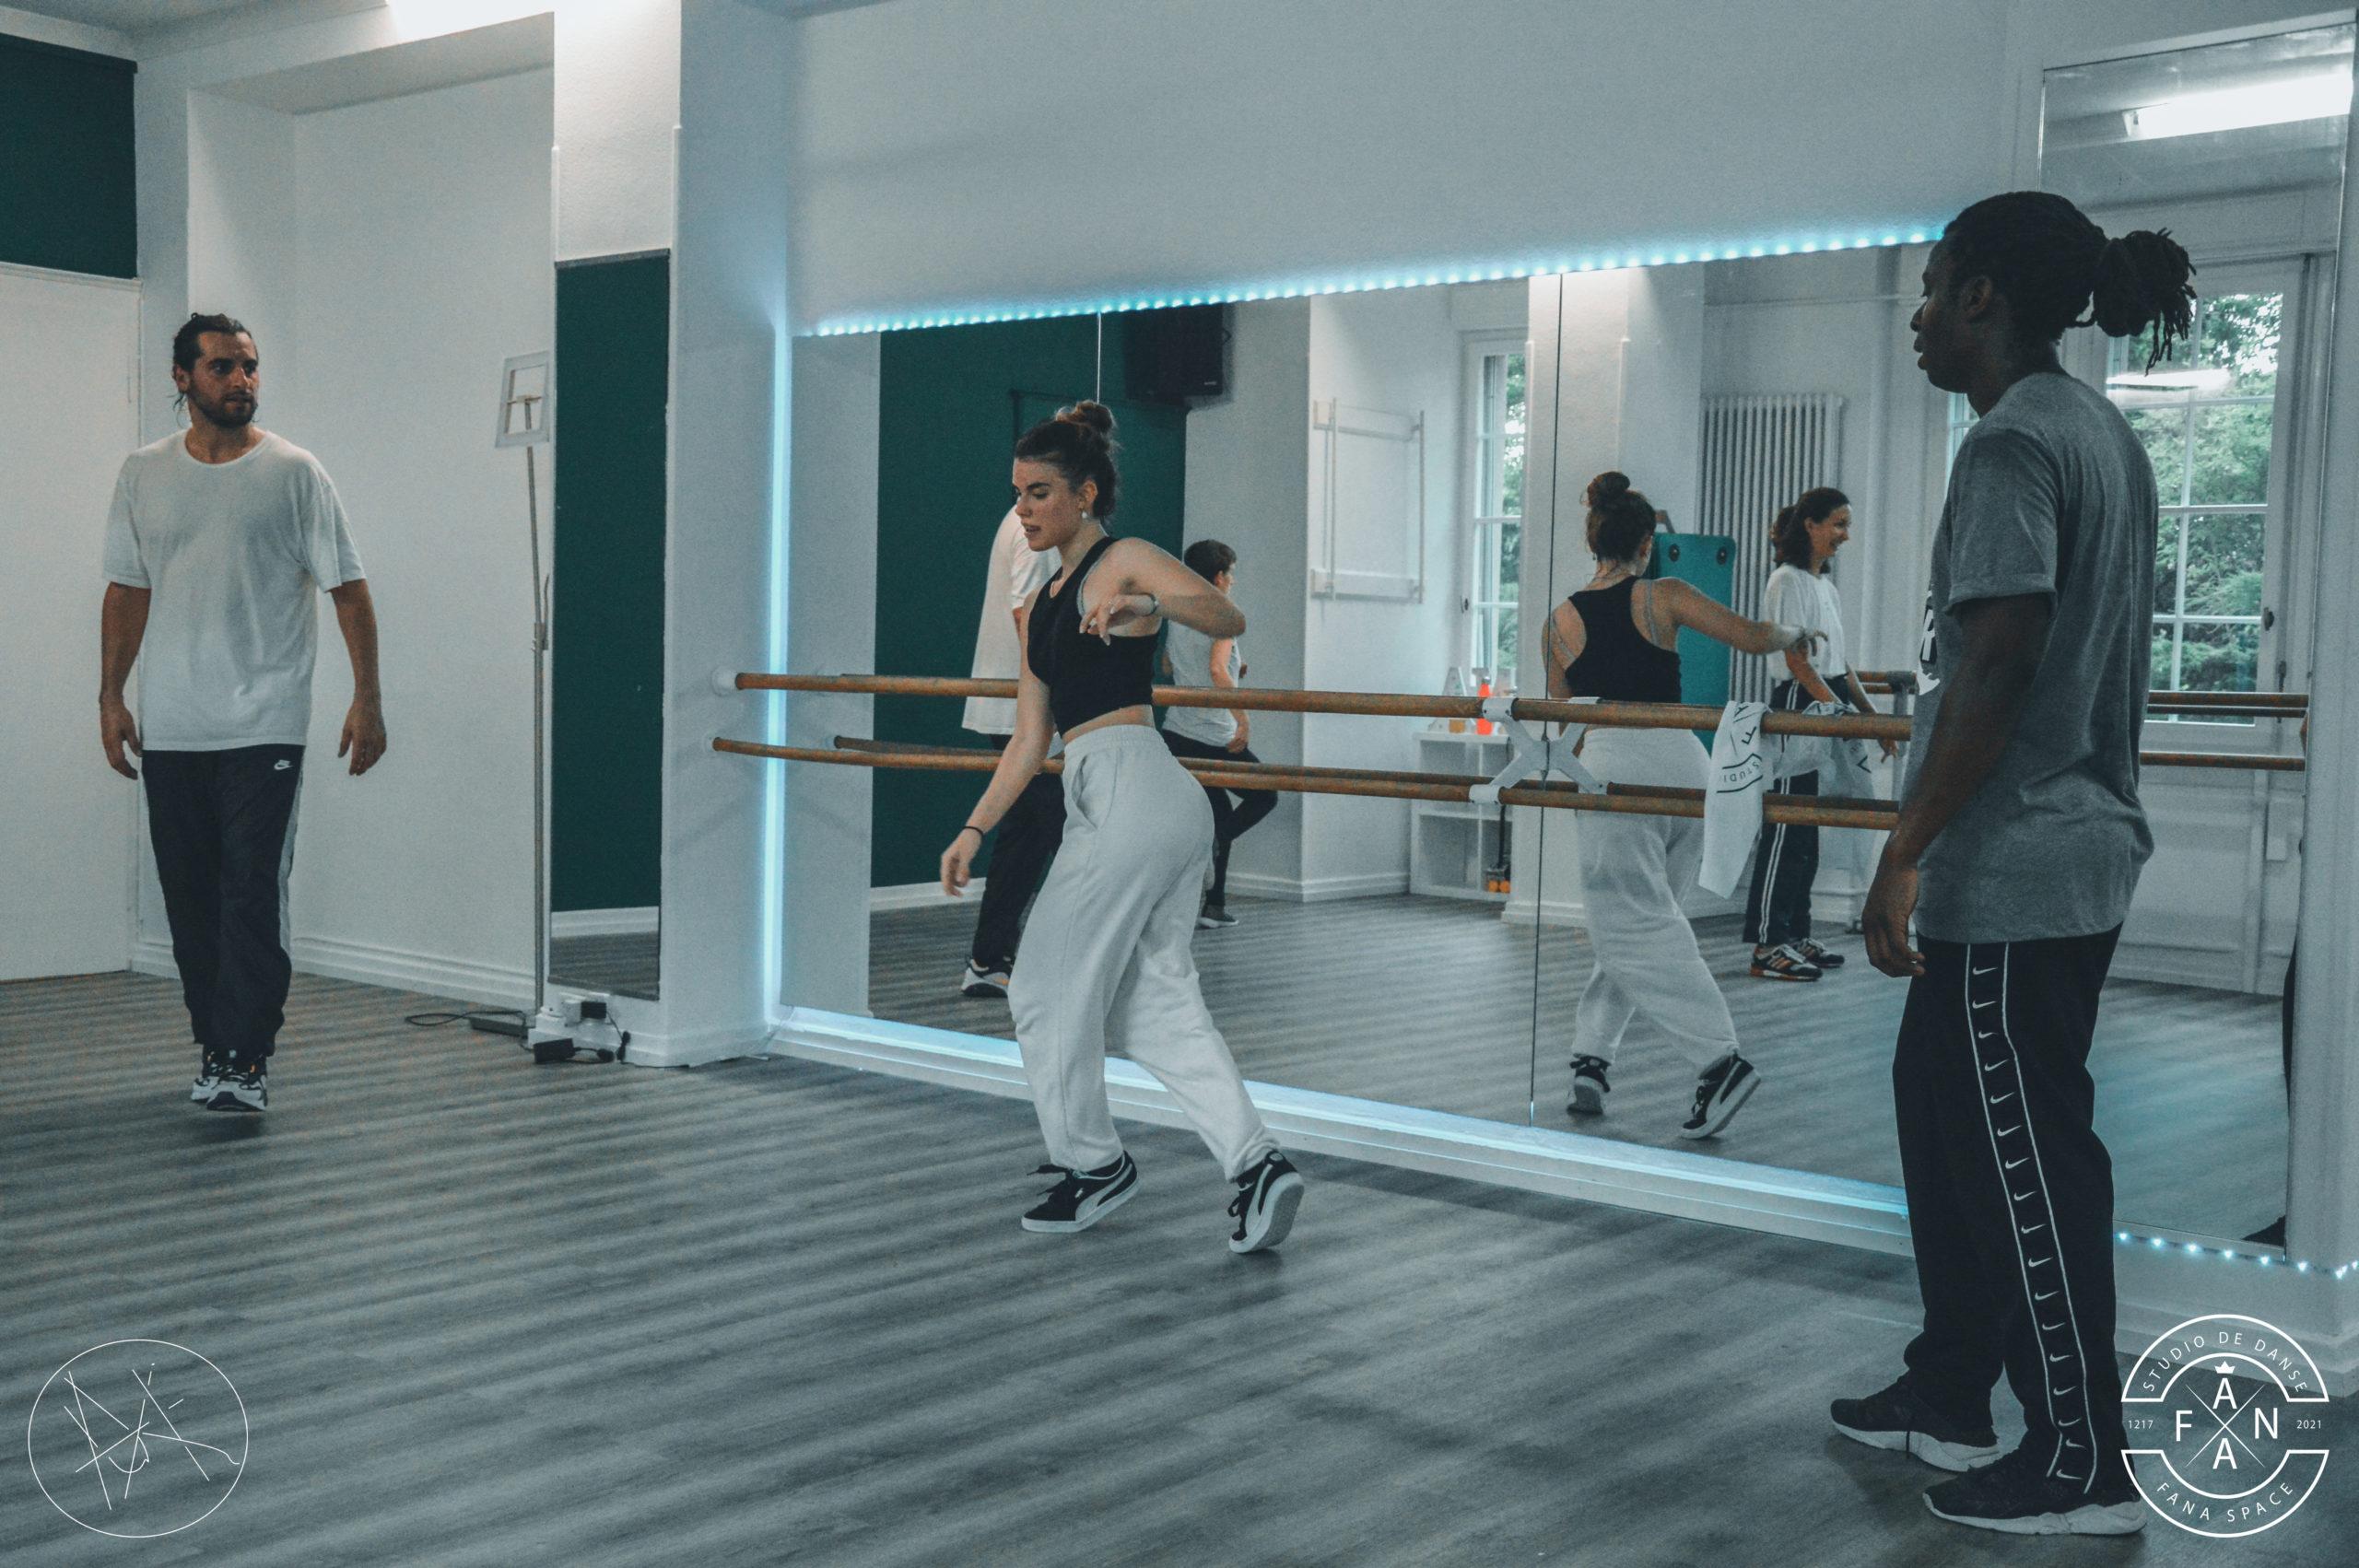 House Dance Lausanne FaNa Space